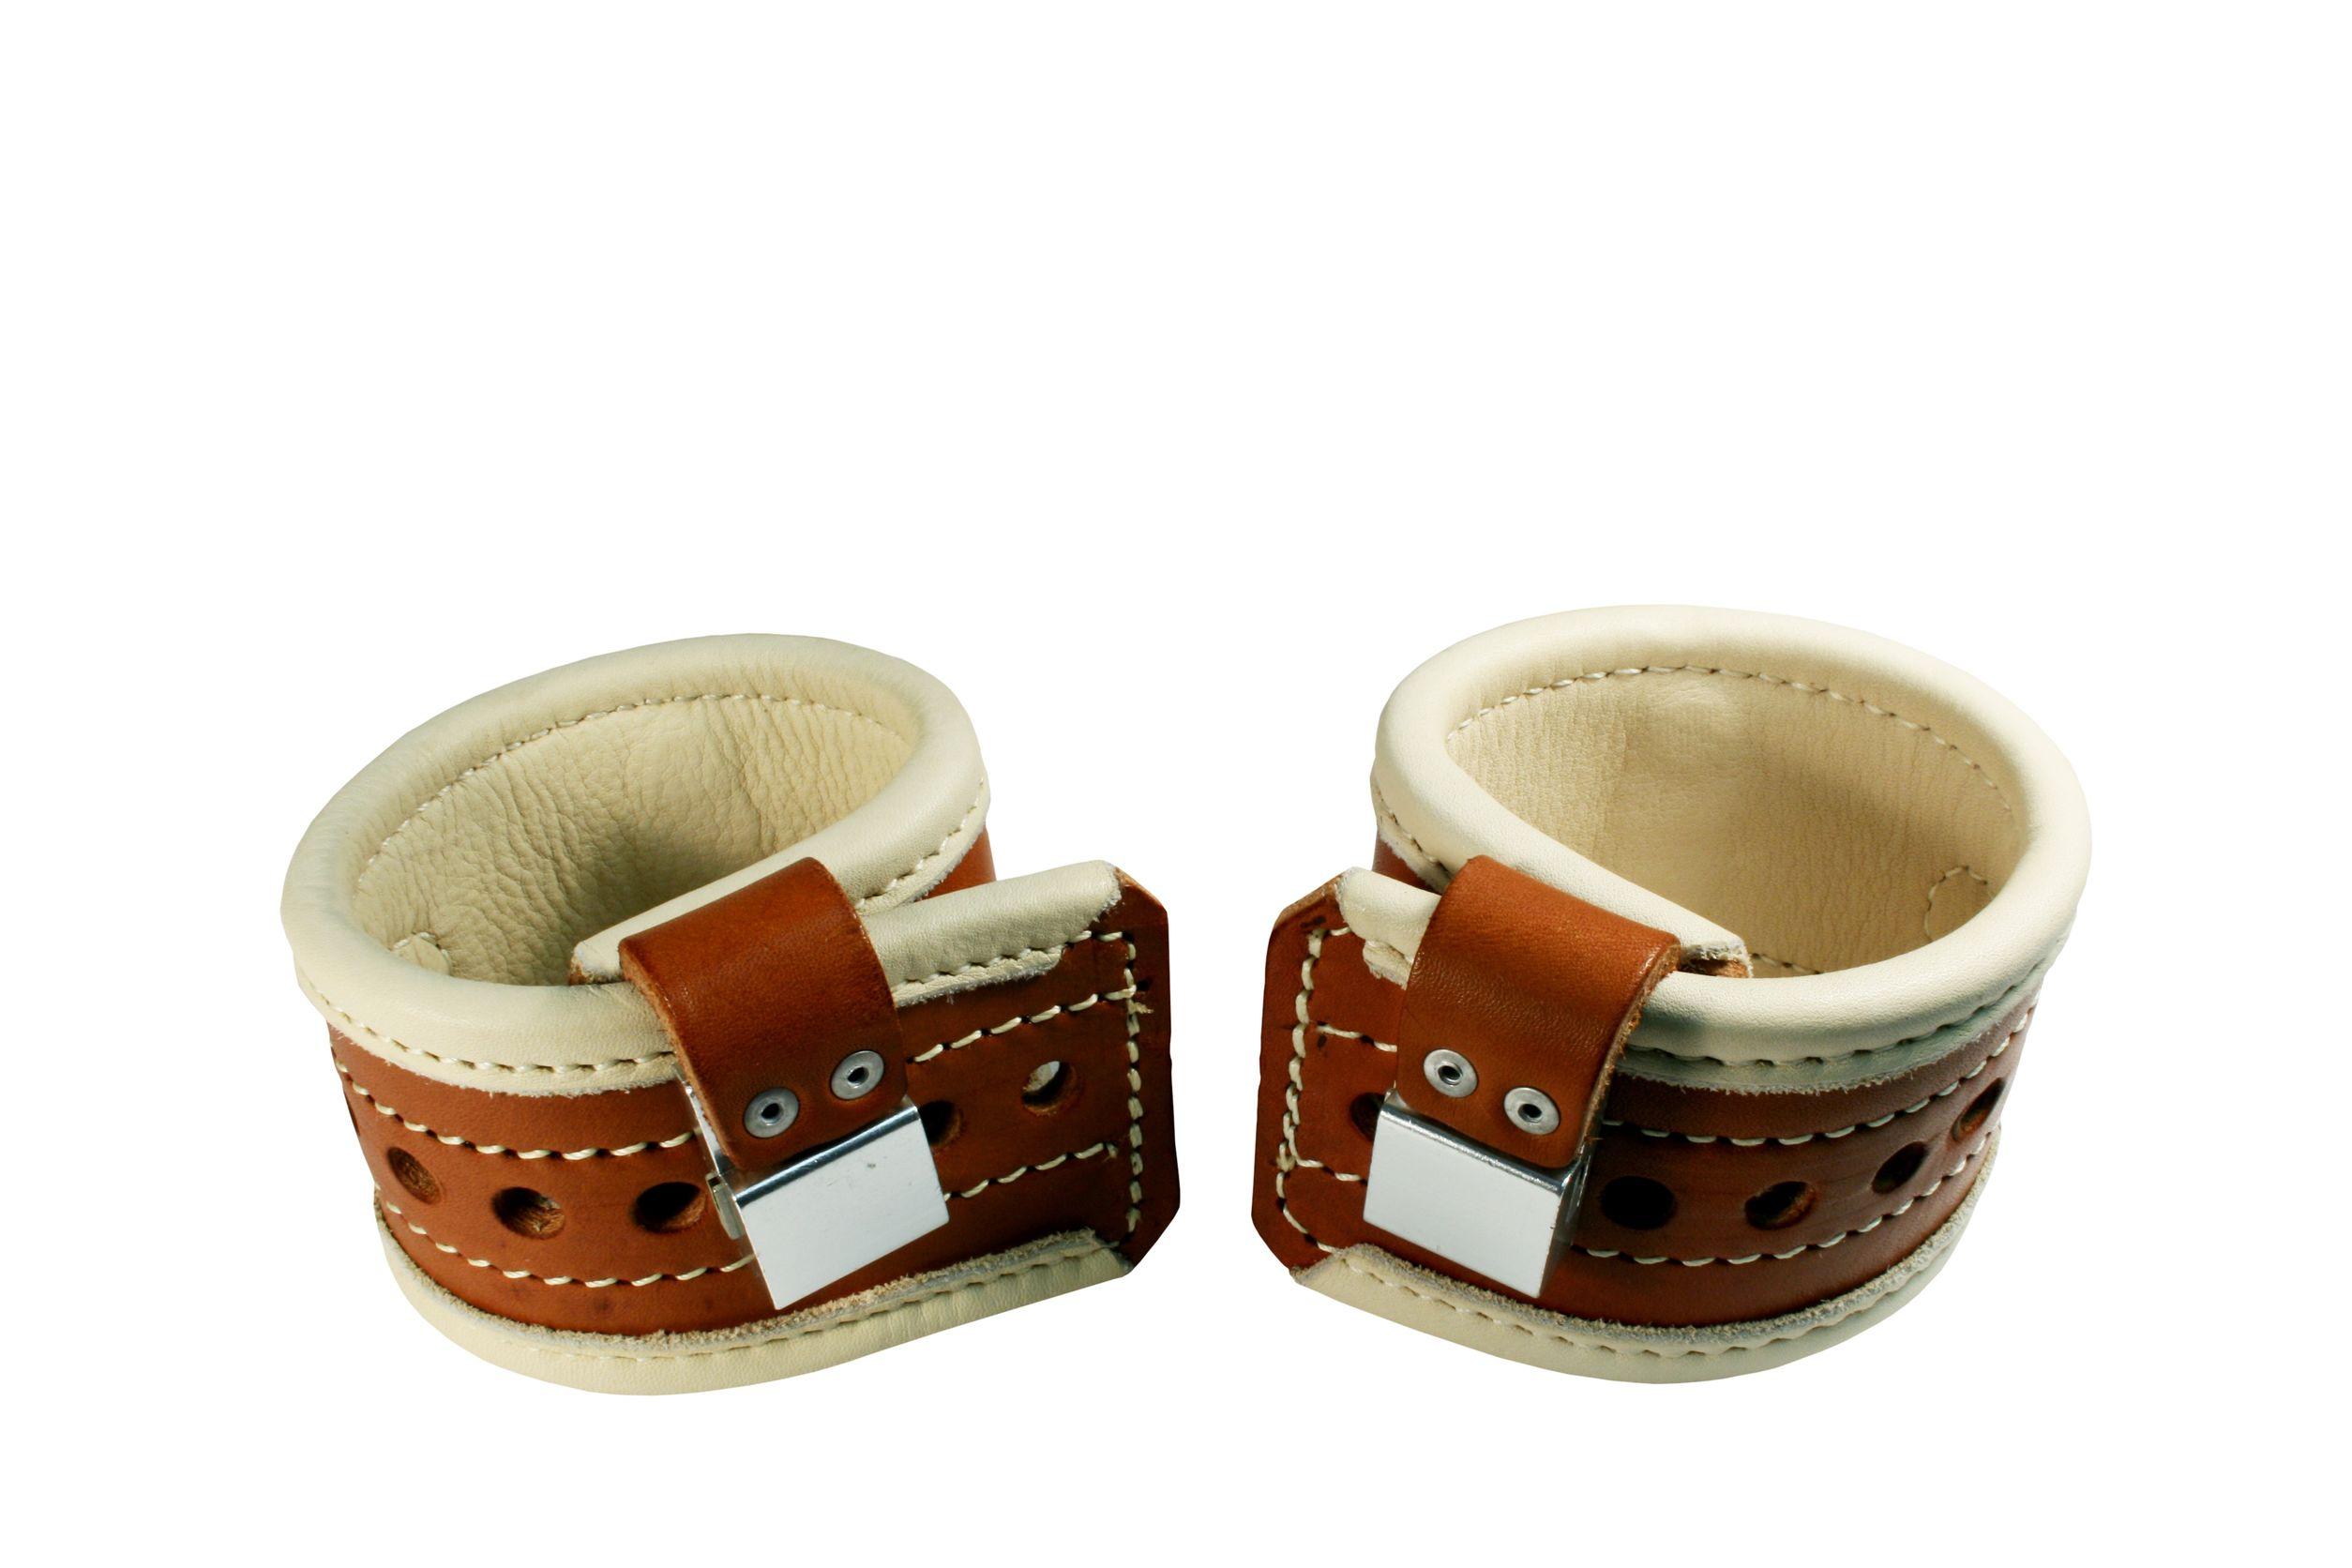 Padded leather wrist restraints.